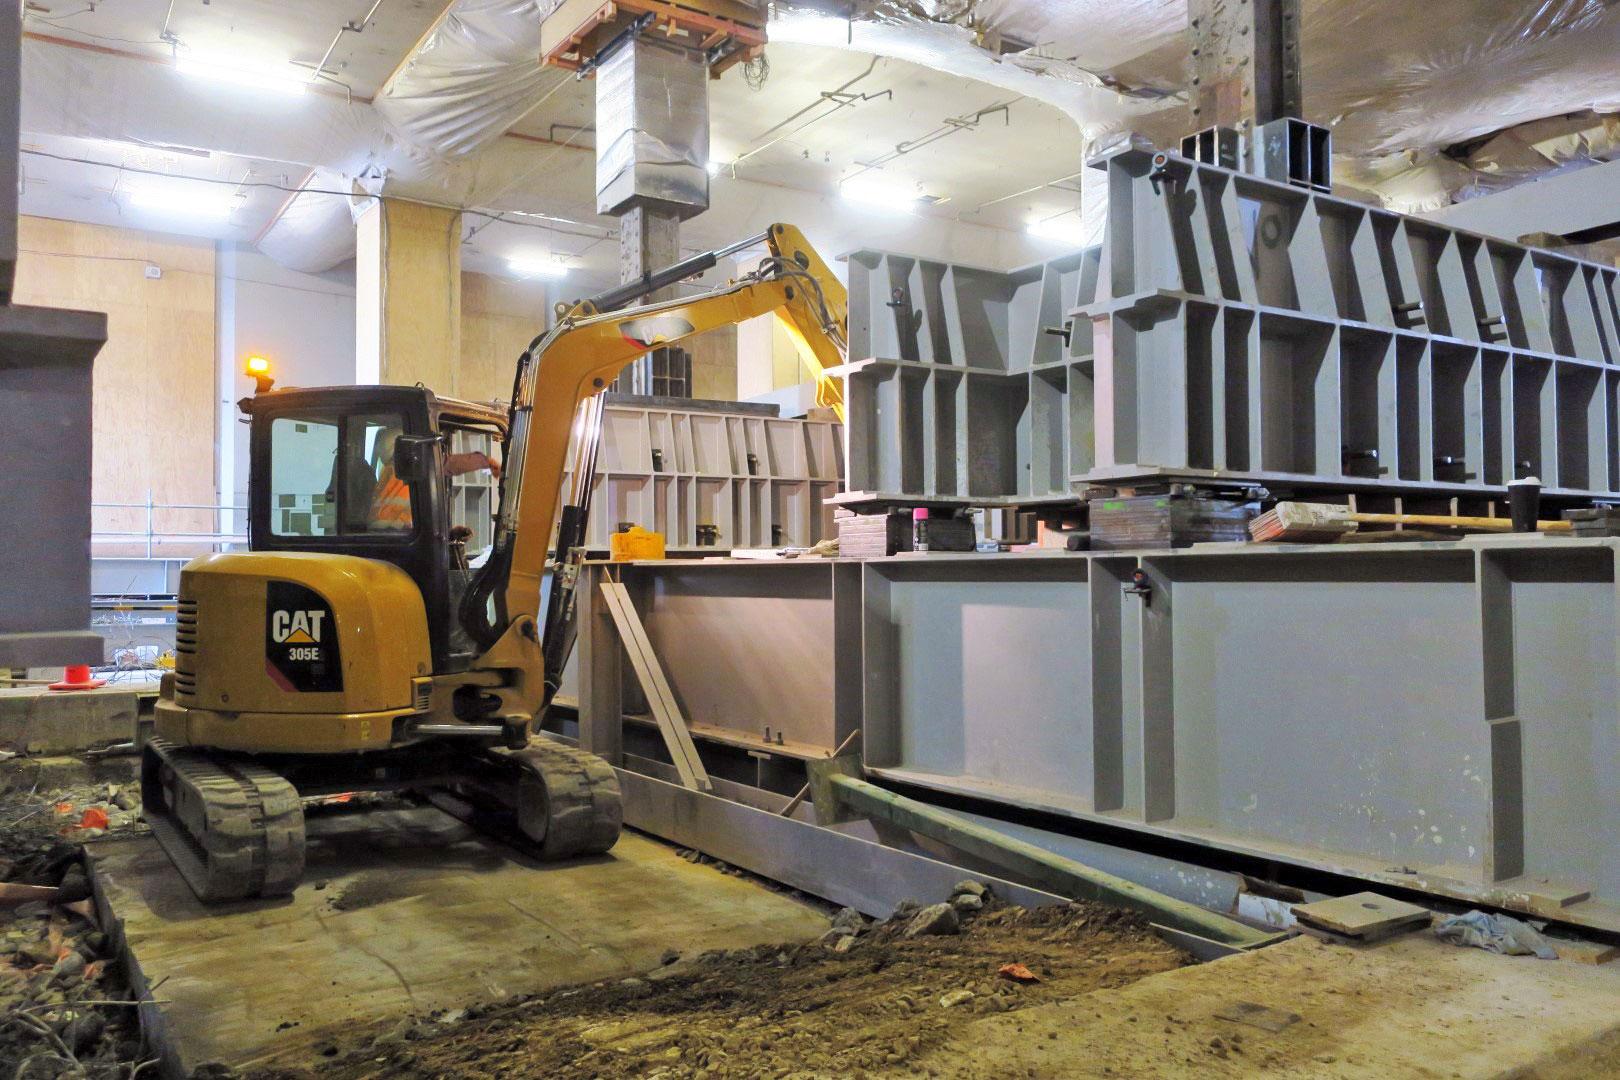 Copy of Excavation of former Chief Post Office floor now underway